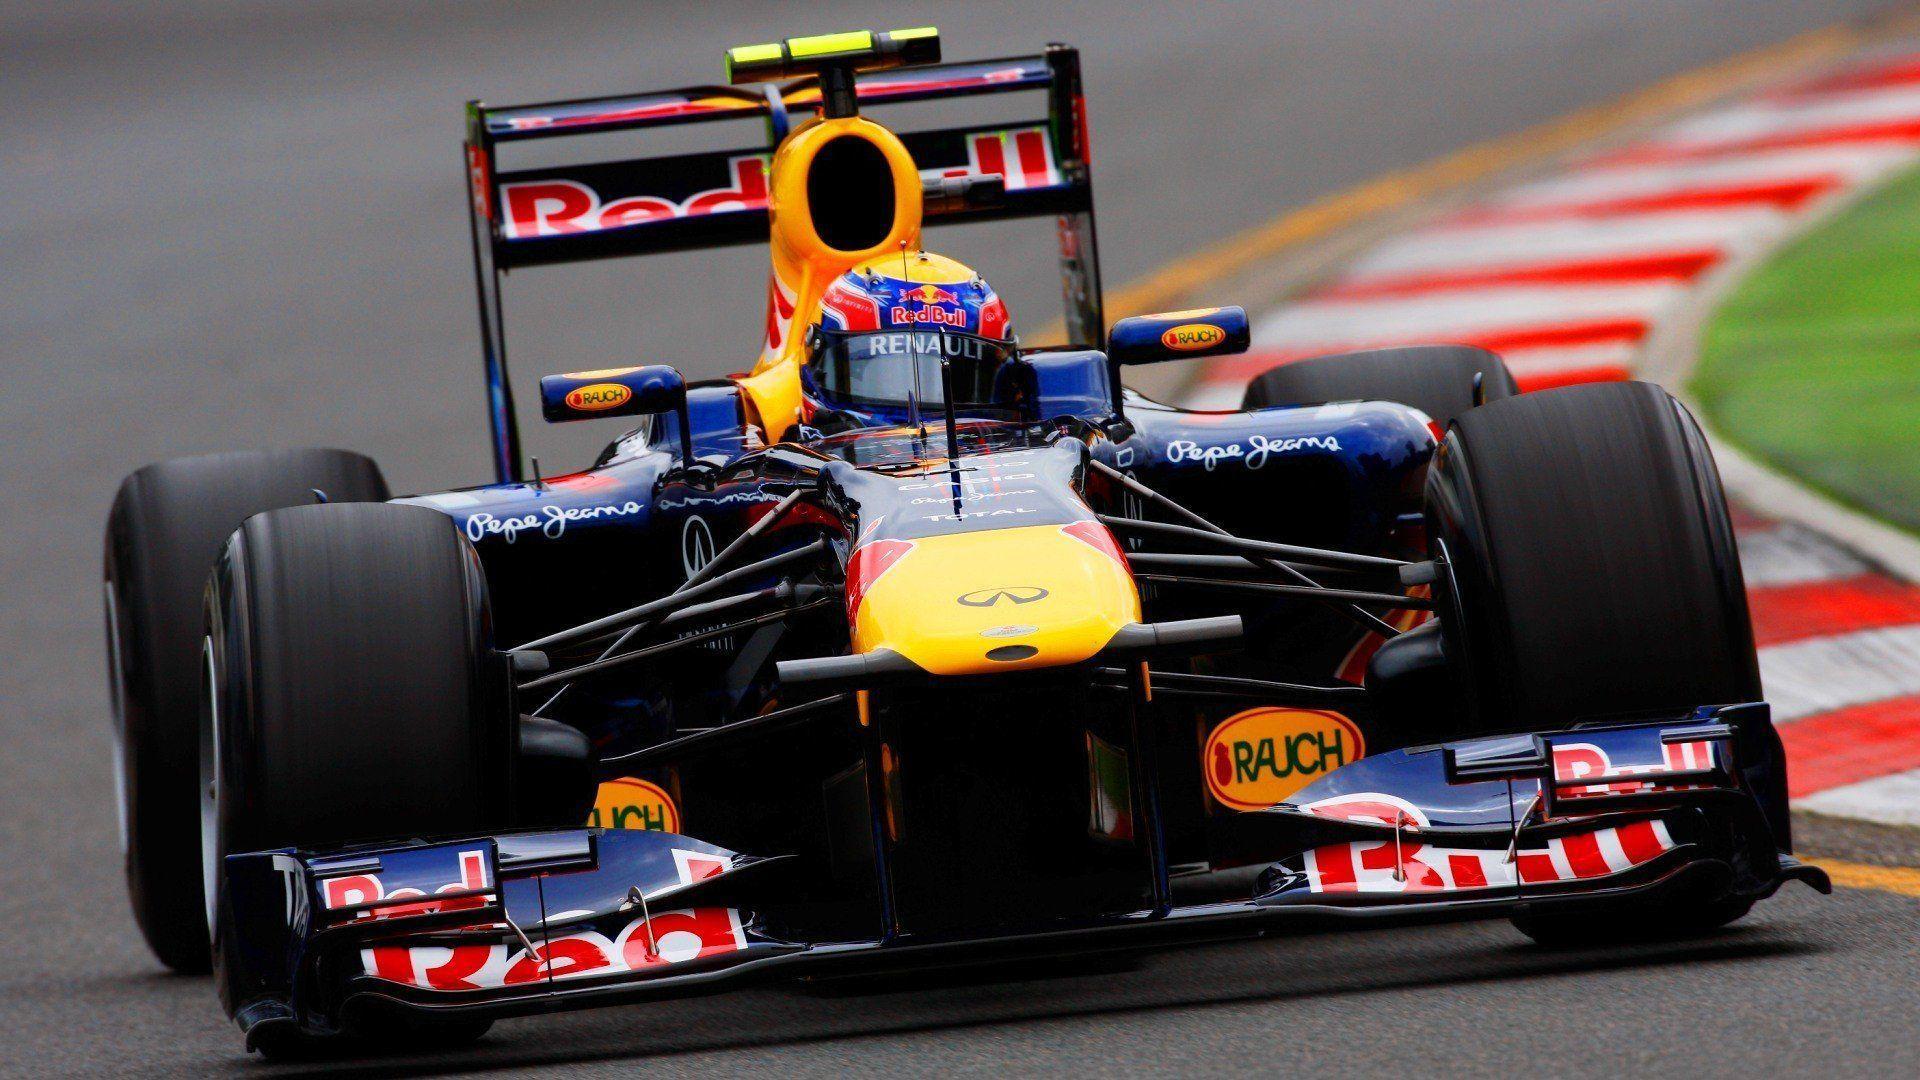 formula 1 sports - photo #28